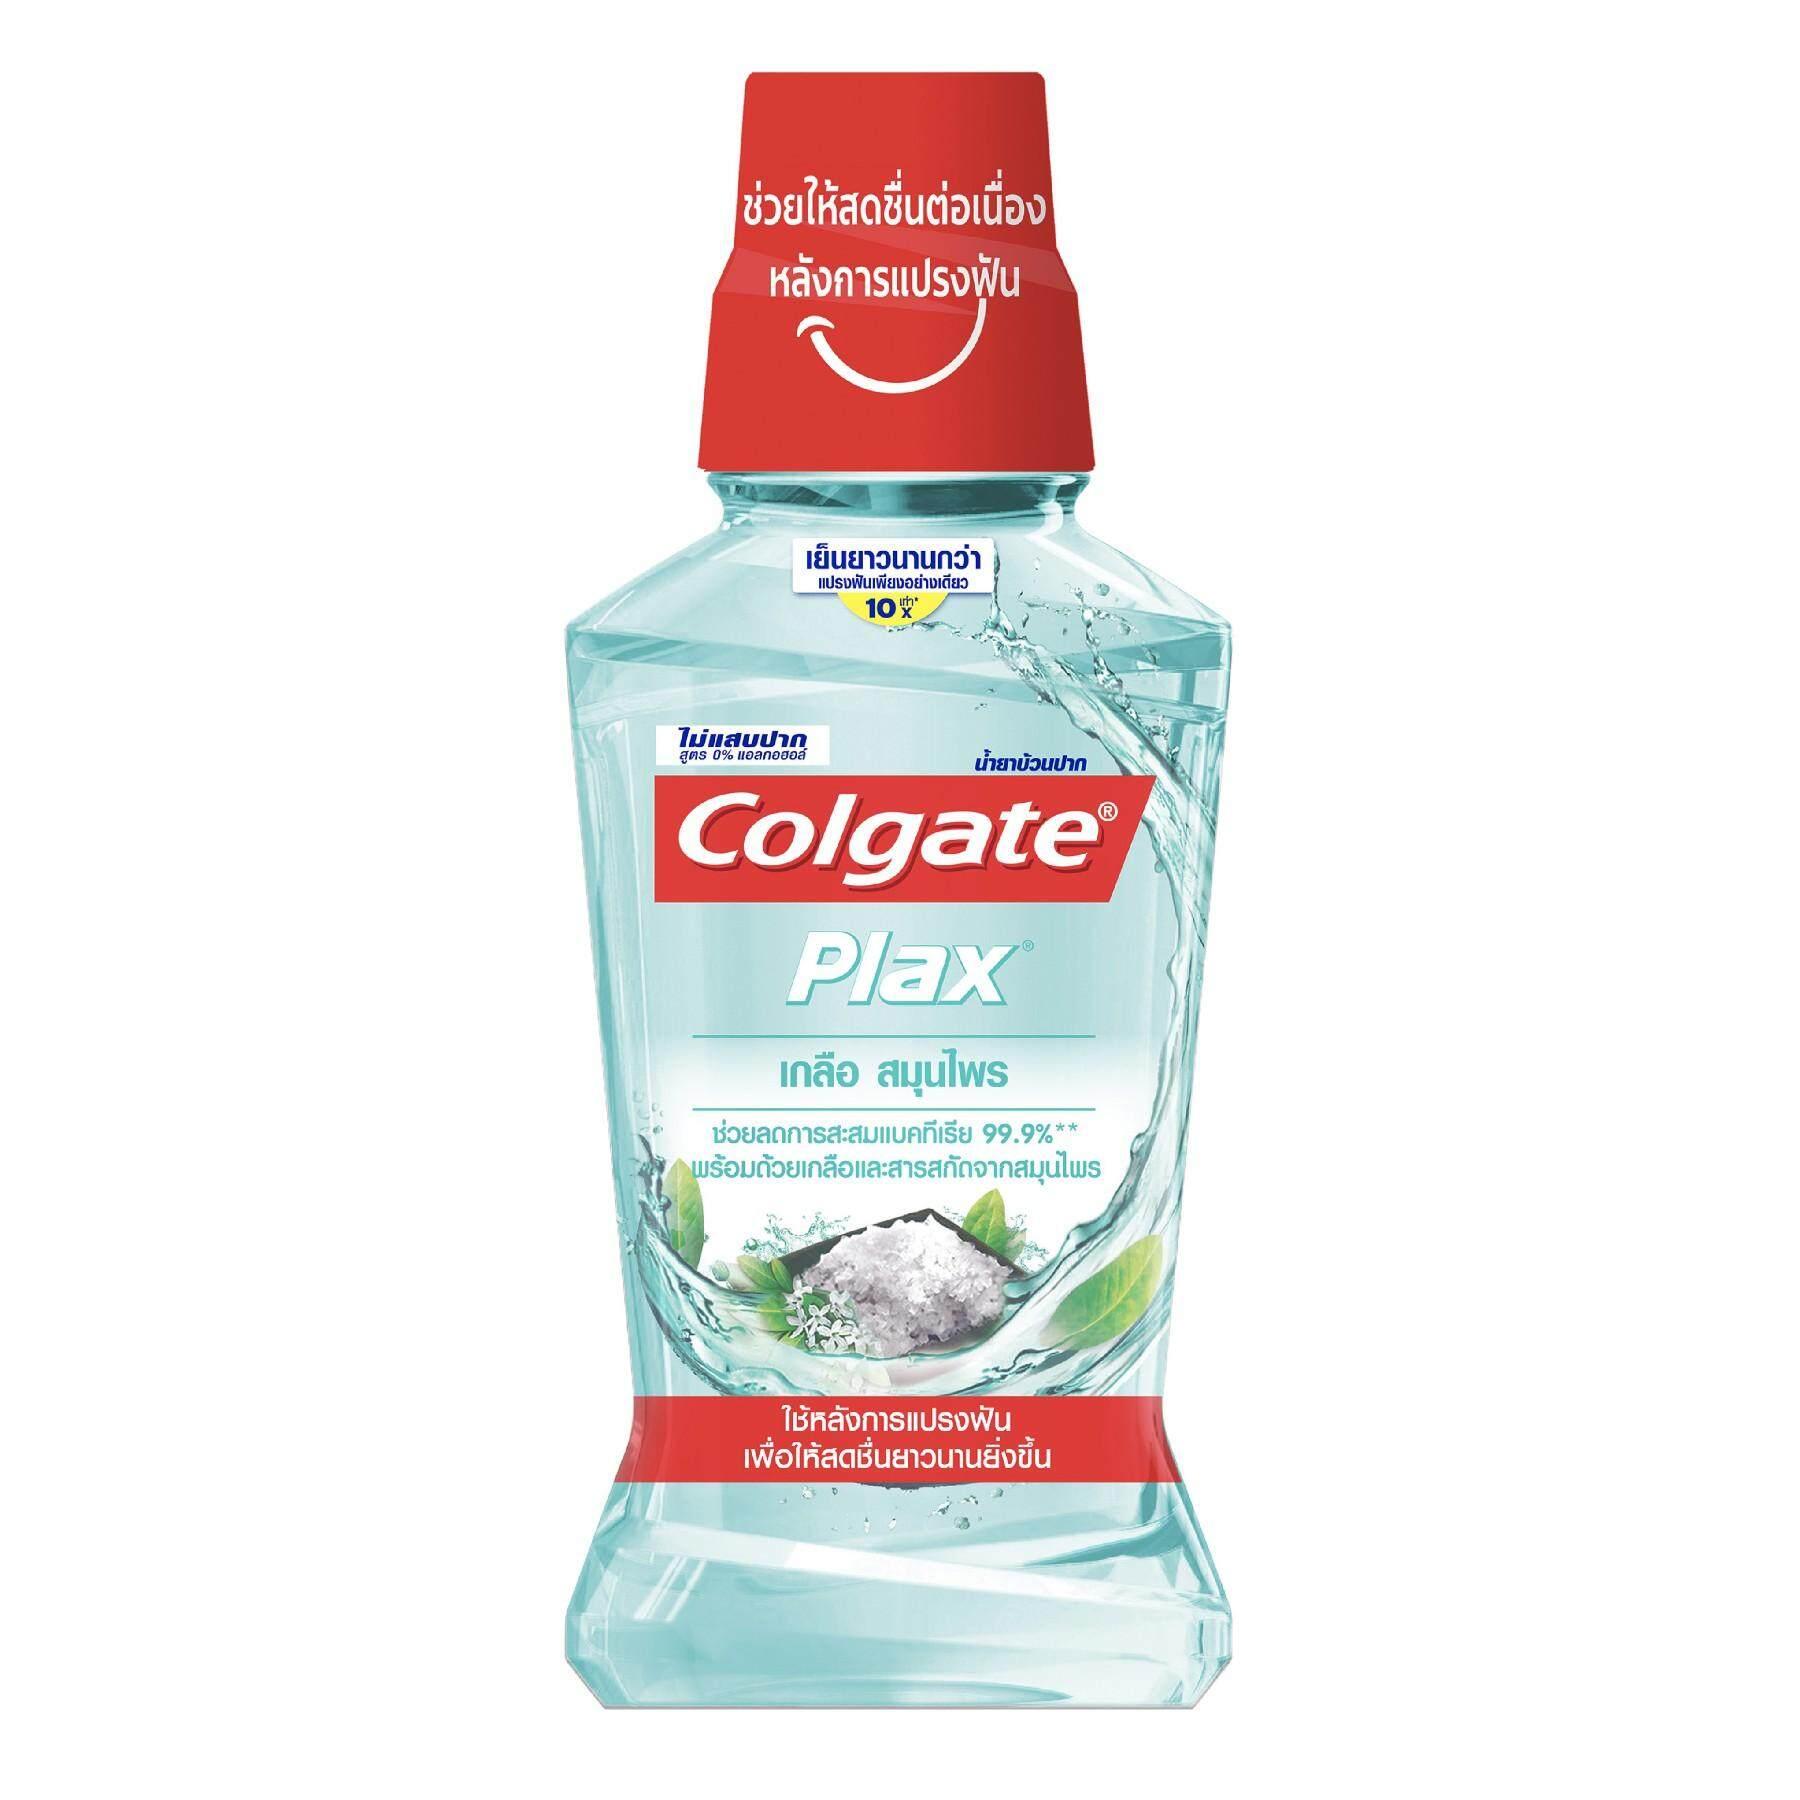 COLGATE น้ำยาบ้วนปาก คอลเกต พลักซ์ เกลือ สมุนไพร 250 มลColgate Plax Salt Herbal Mouthwash 250ml (Mouthwash,Mouth,Oral,Oral Care,น้ำยาบ้วนปาก,ช่องปาก,สุขภาพฟัน) ของแท้